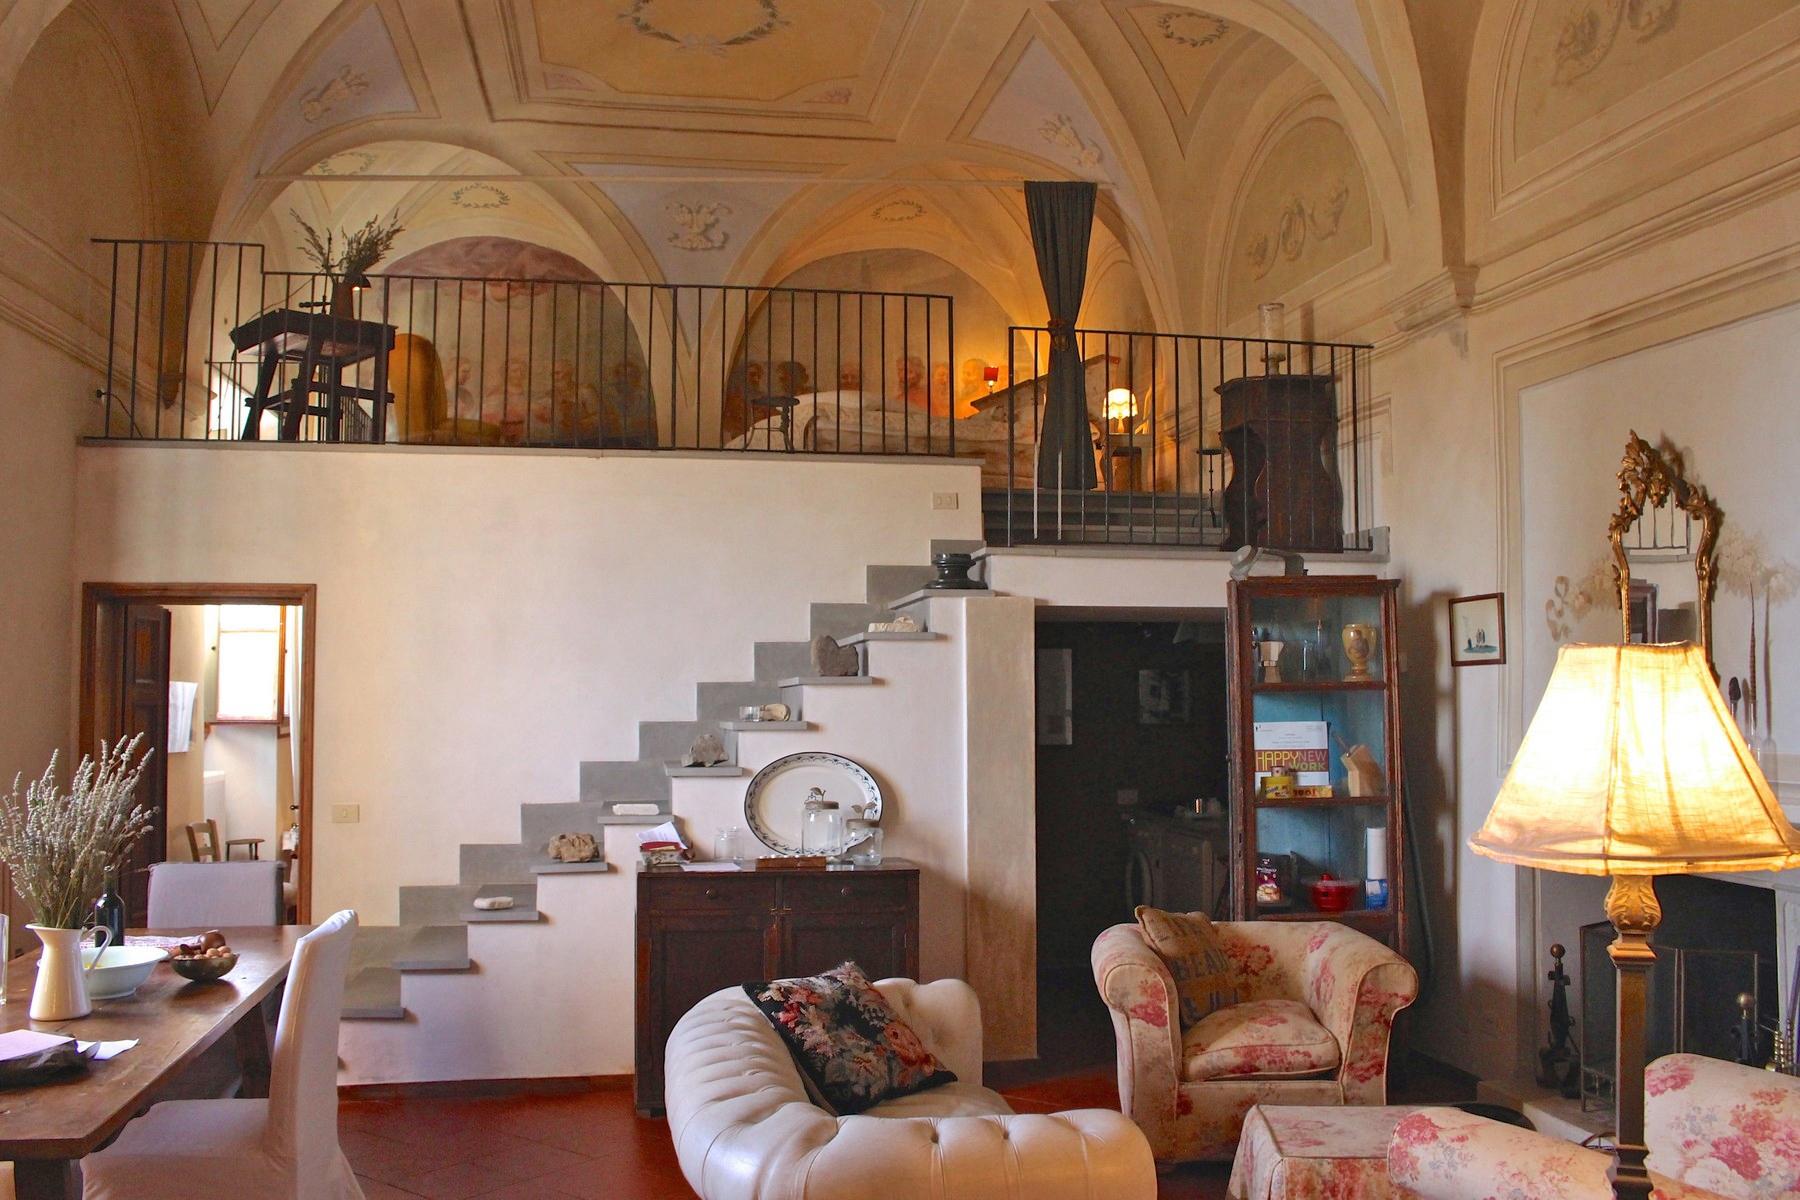 Appartamento in Vendita a San Casciano In Val Di Pesa: 4 locali, 85 mq